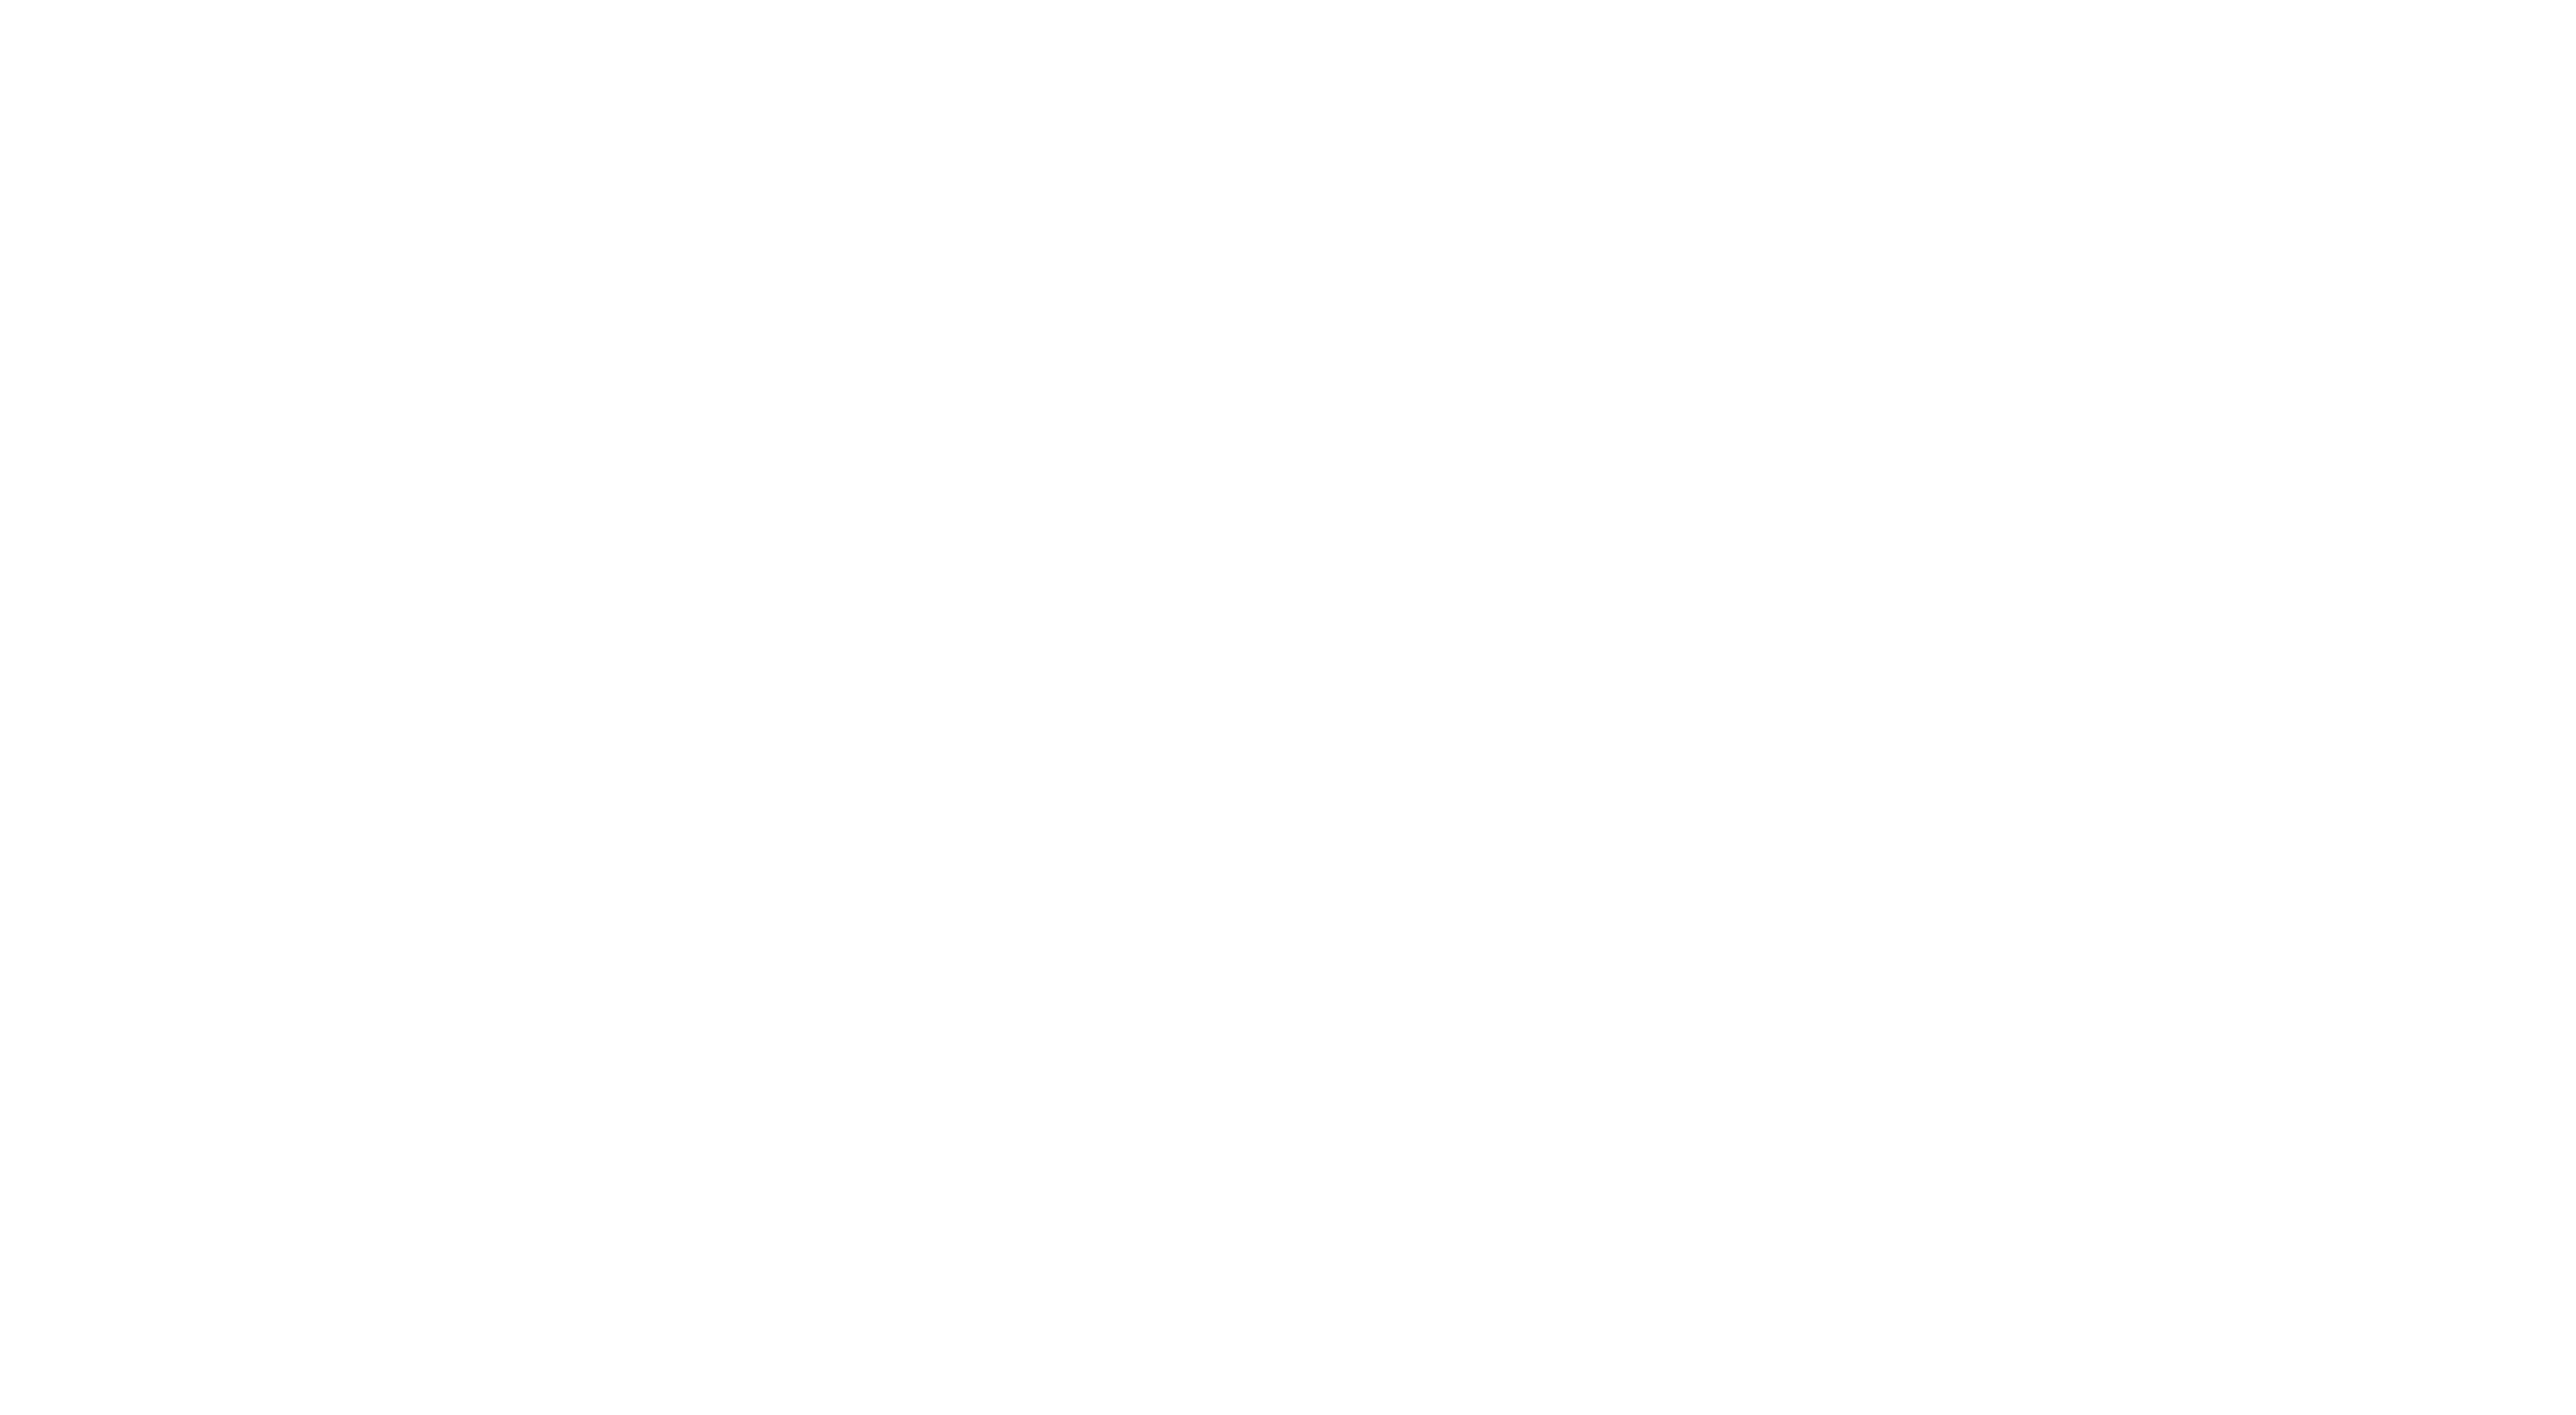 Planet clipart planetarium. Home rochester museum science